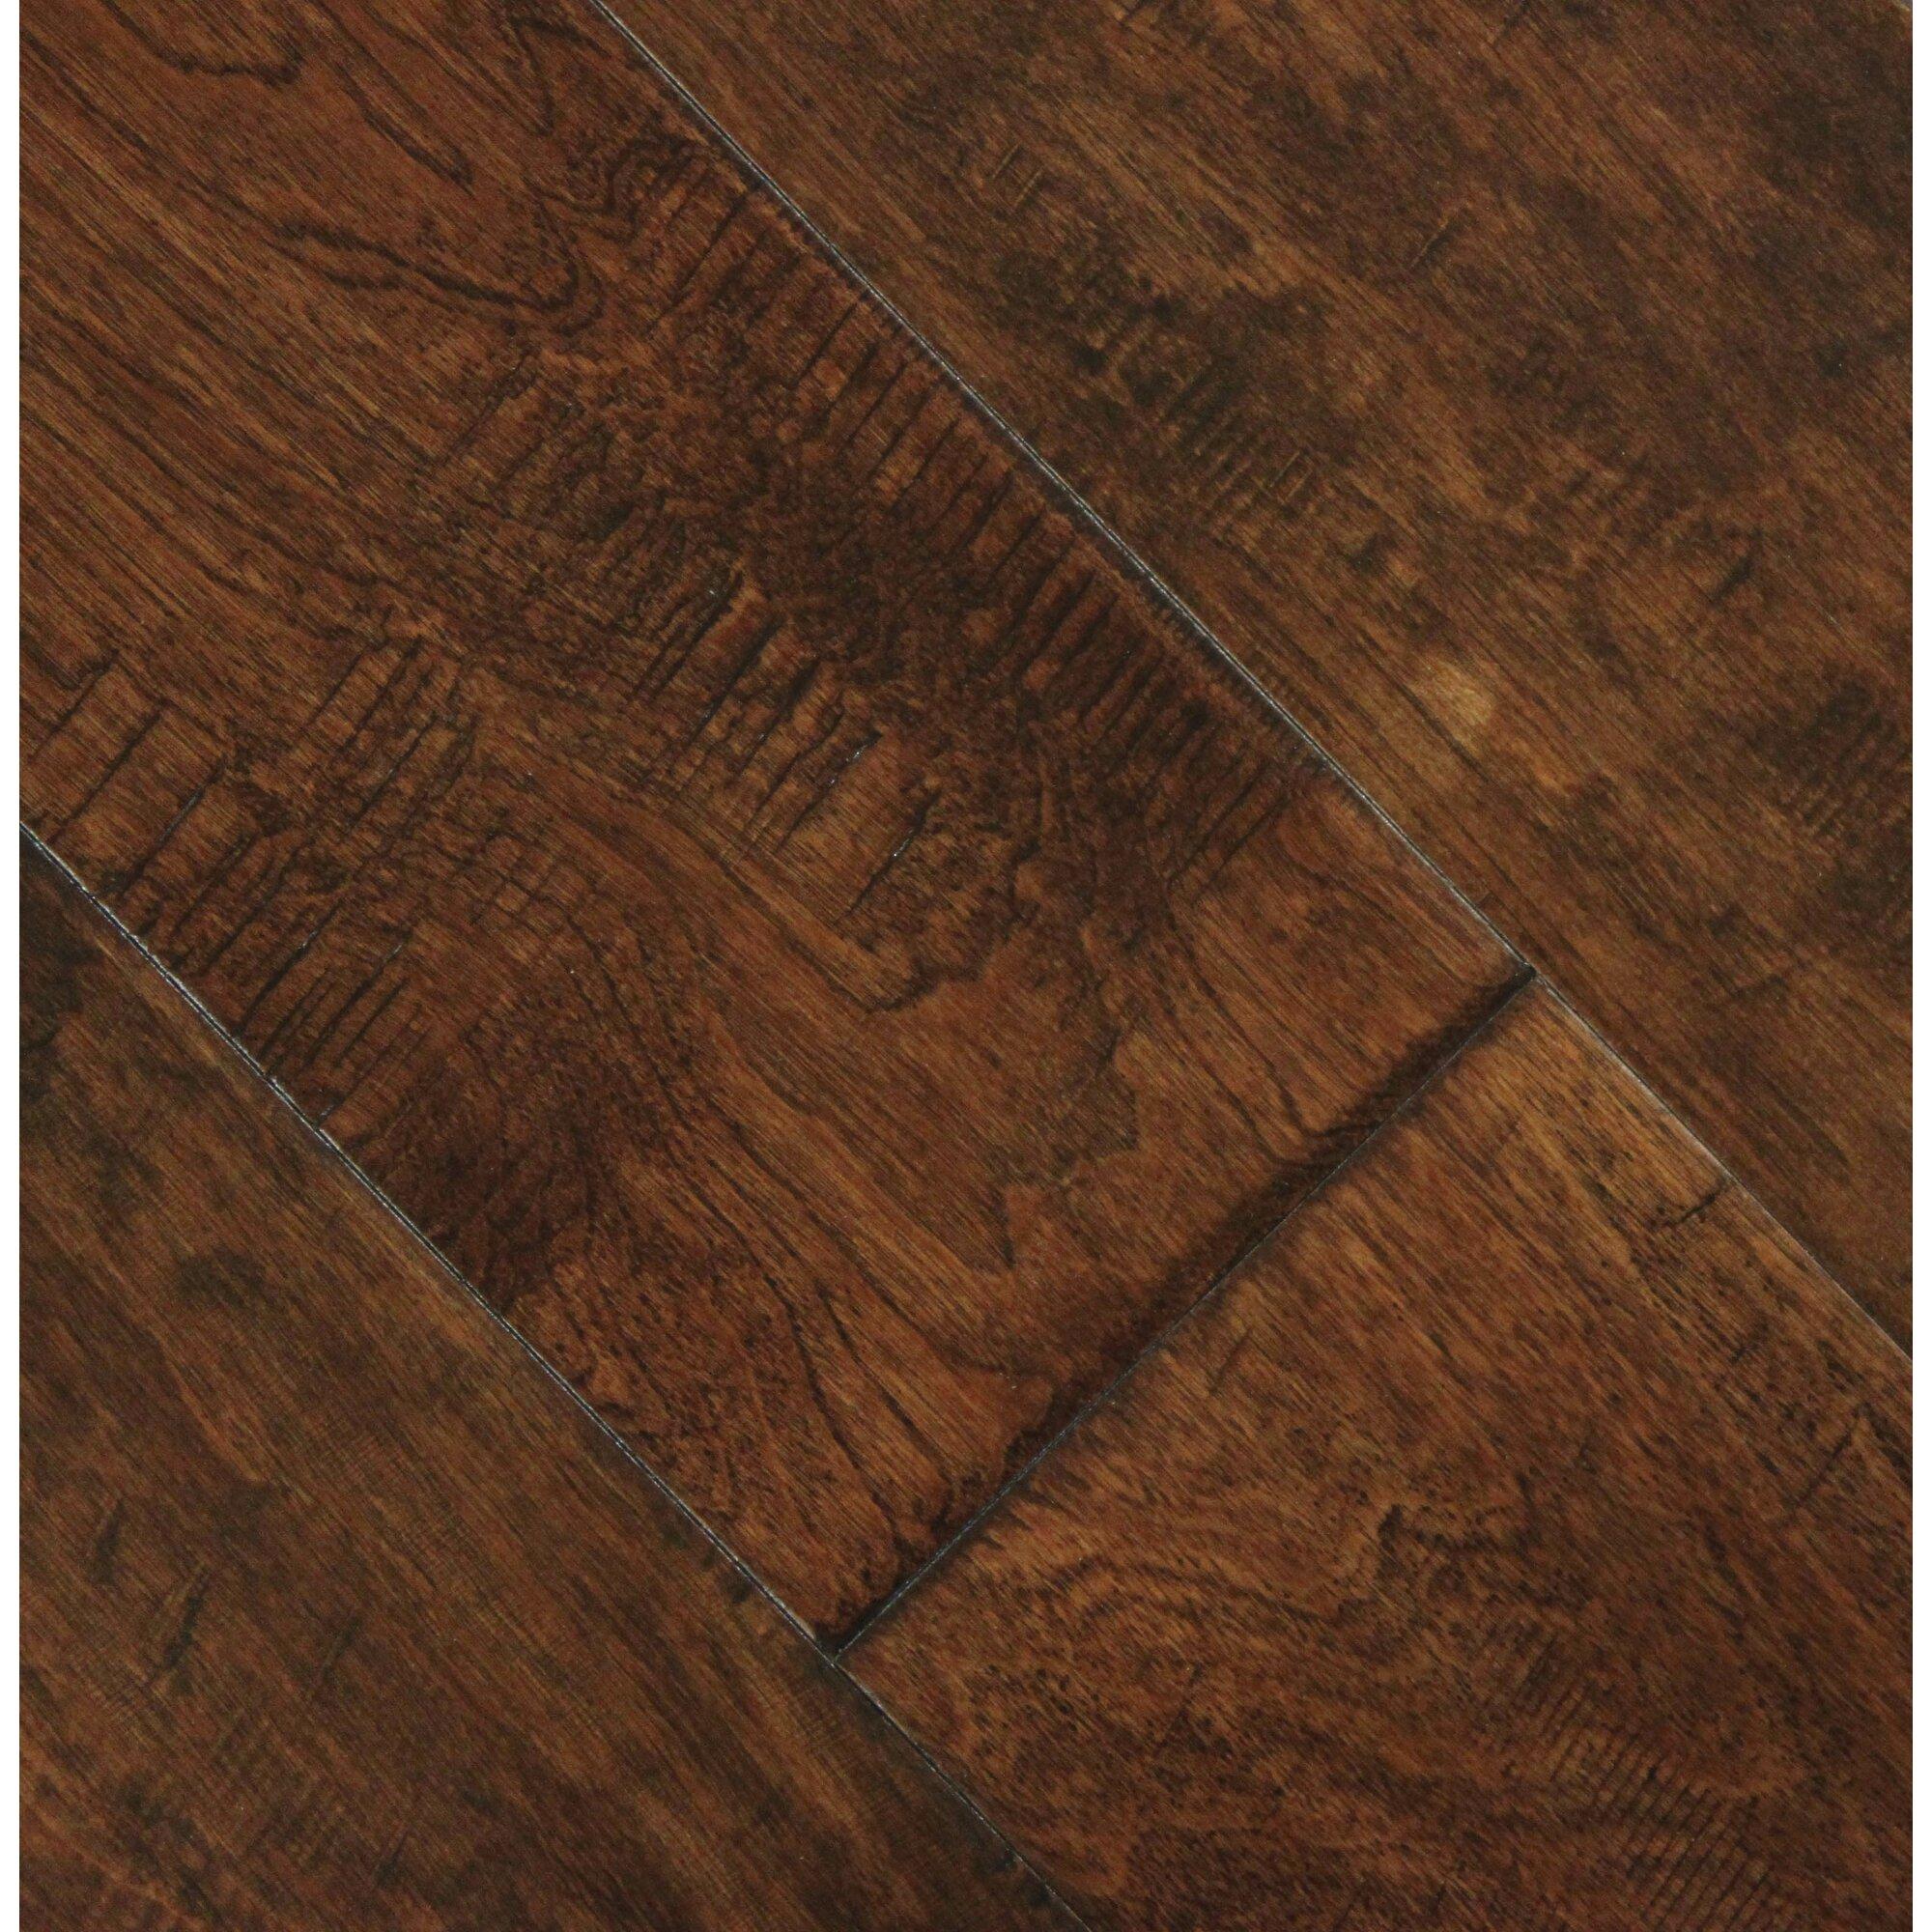 Birch Hardwood Flooring canadian northern birch natural 34 in x 3 14 in Pioneer 5 Engineered Birch Hardwood Flooring In Tomahawk